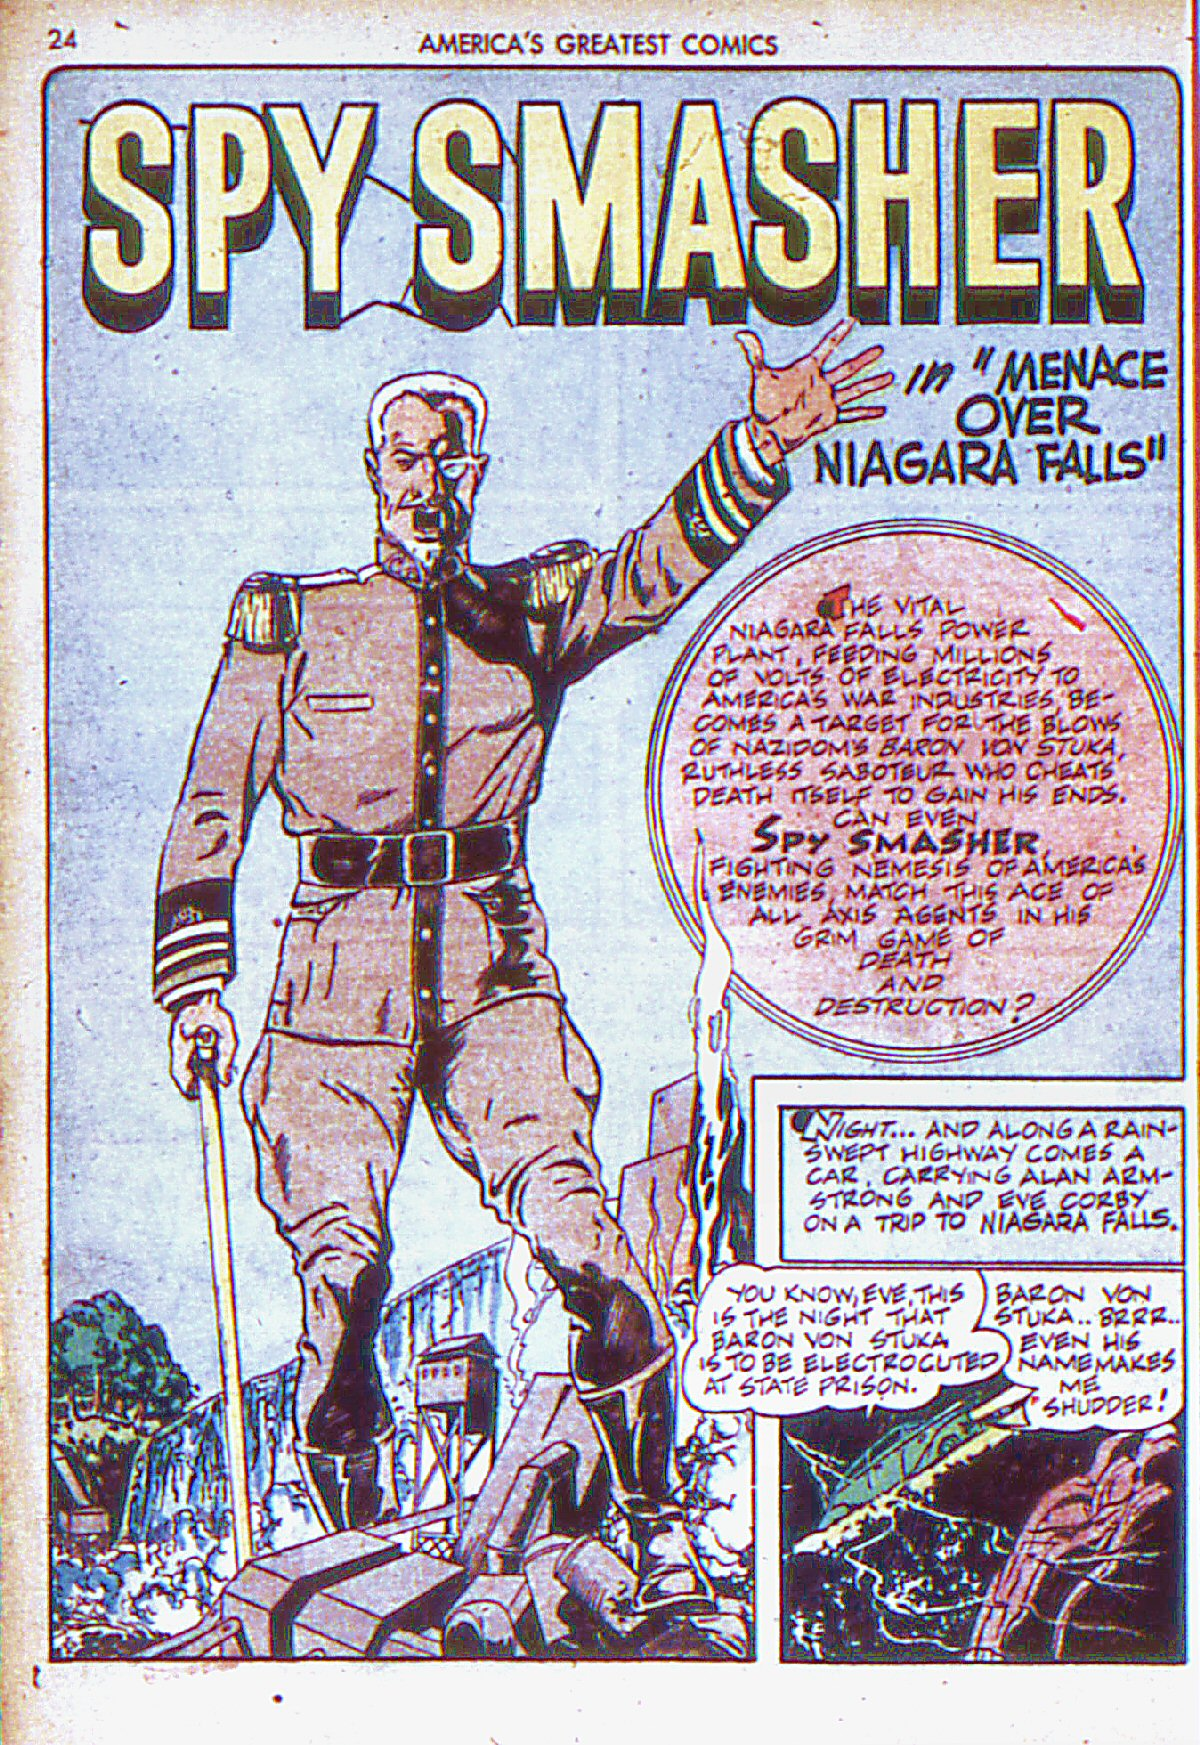 Read online America's Greatest Comics comic -  Issue #6 - 25